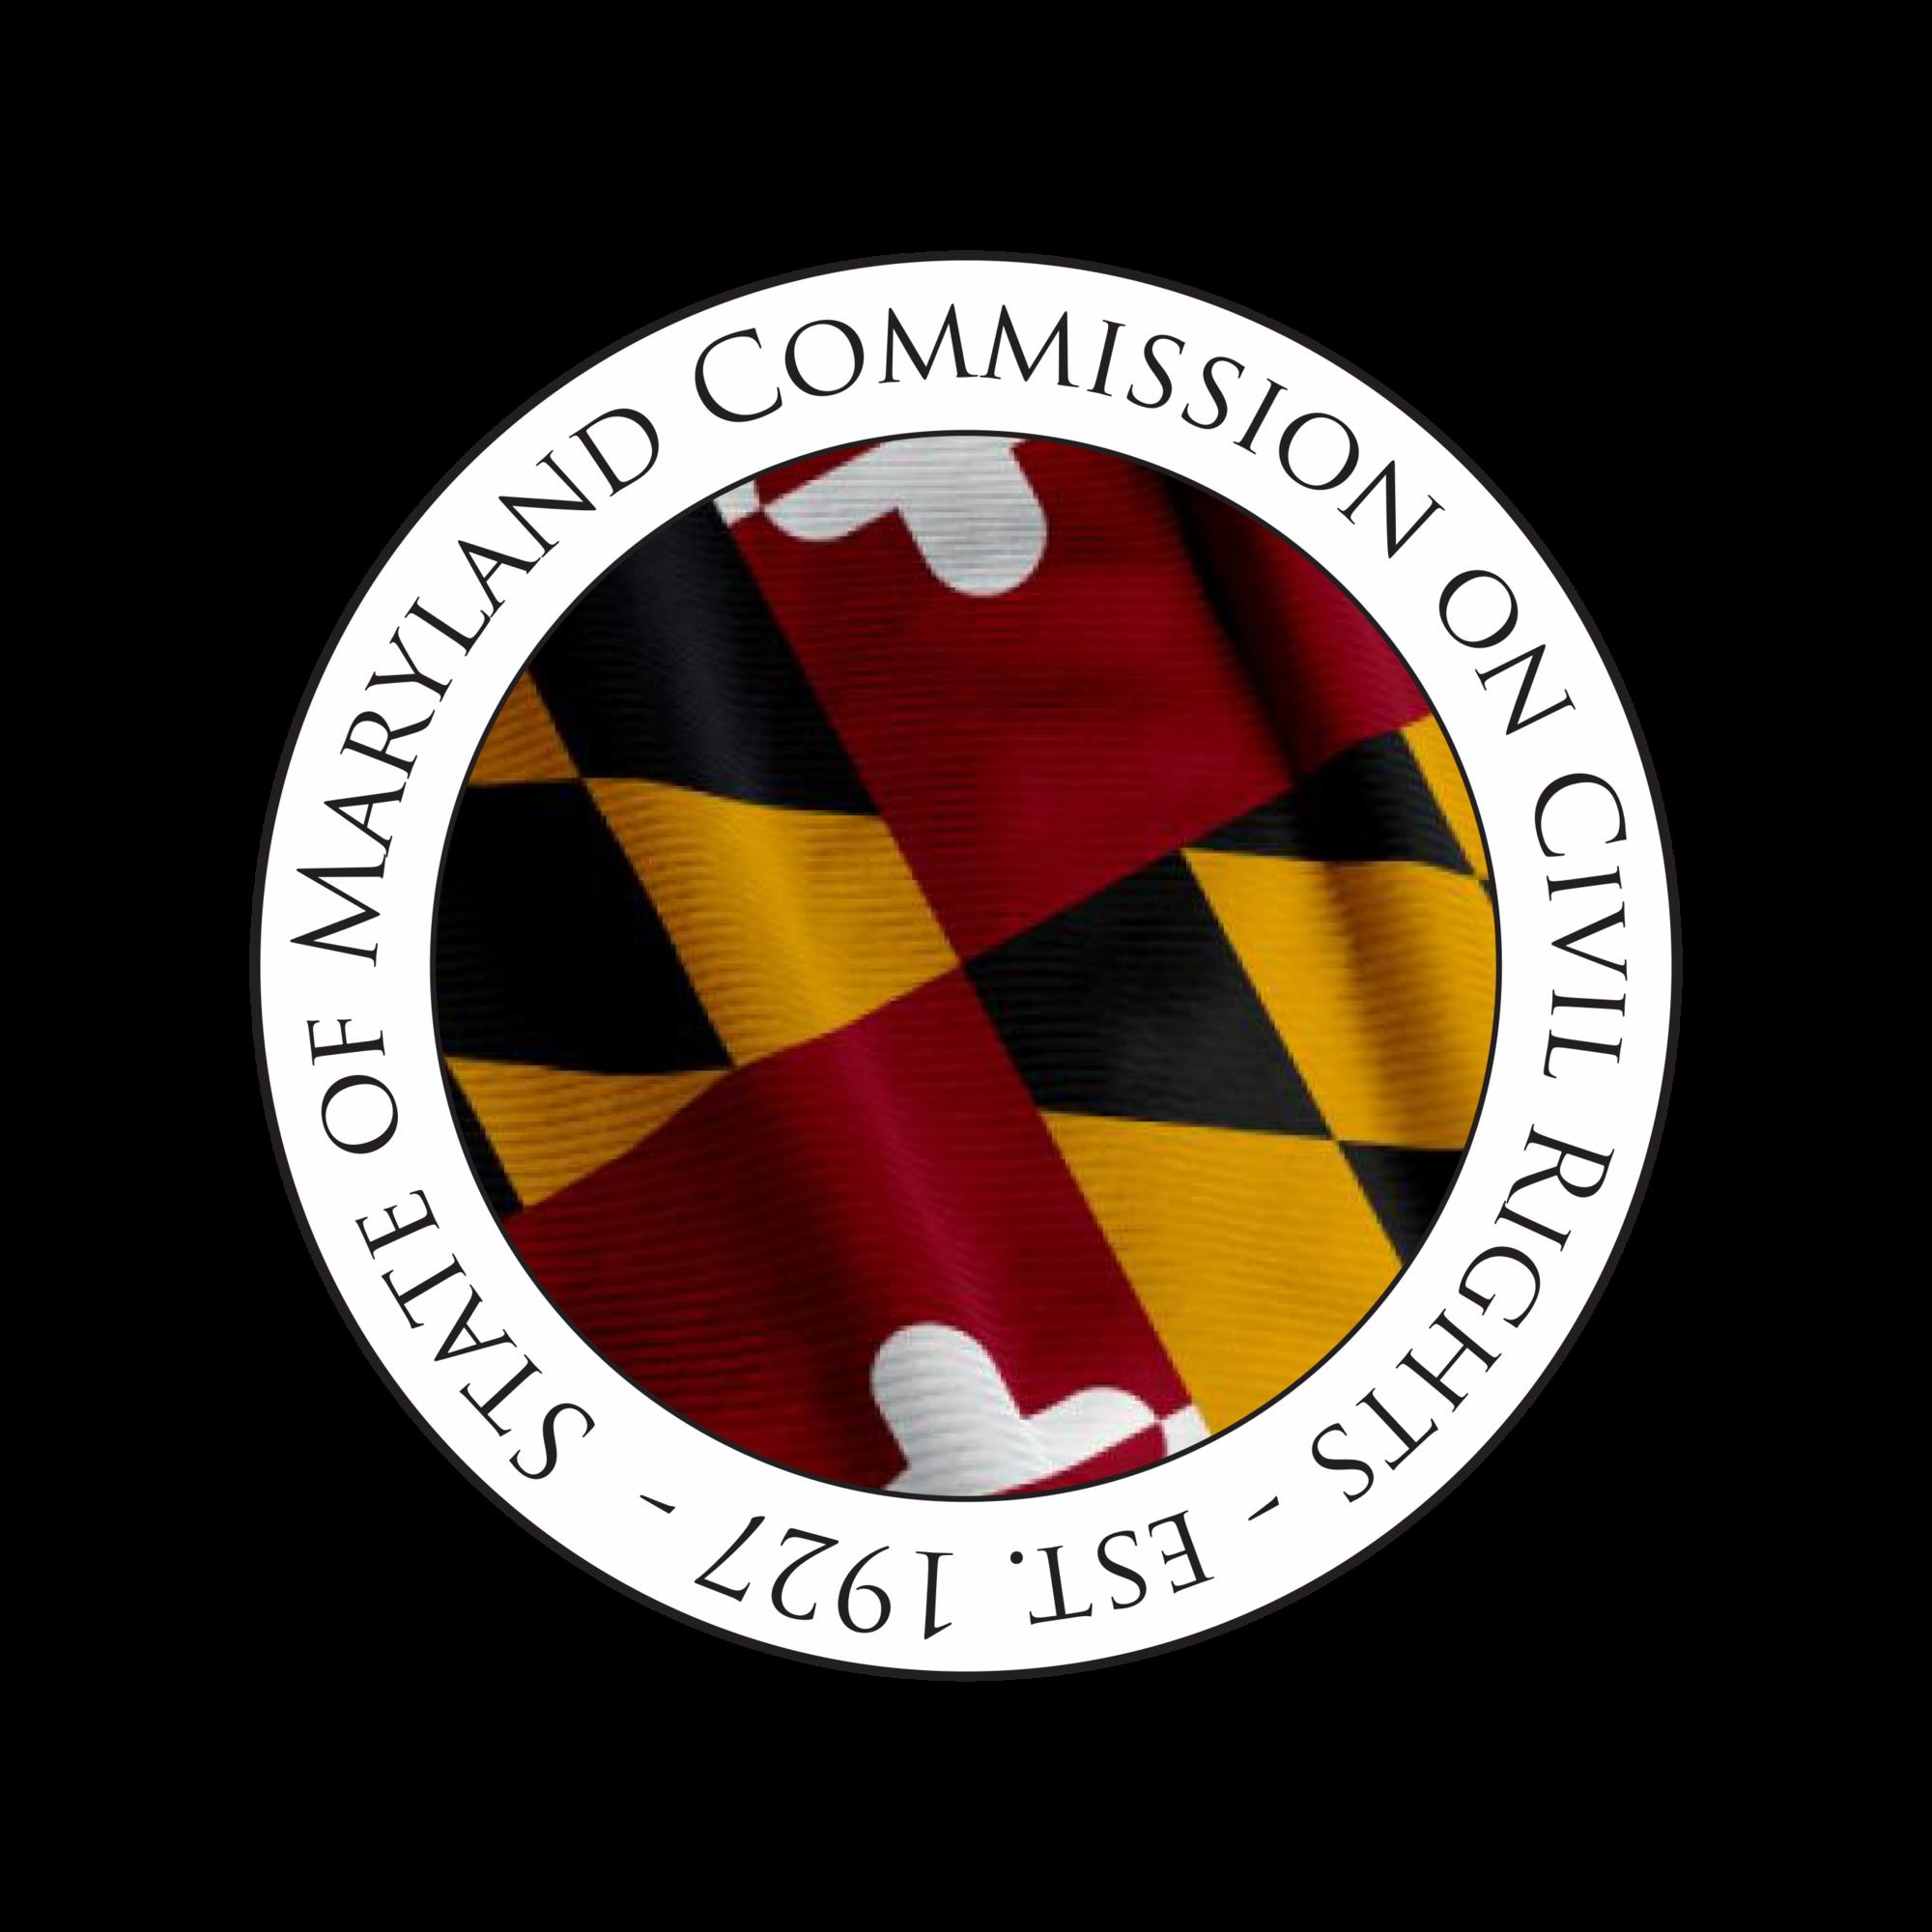 Maryland MCCR logo